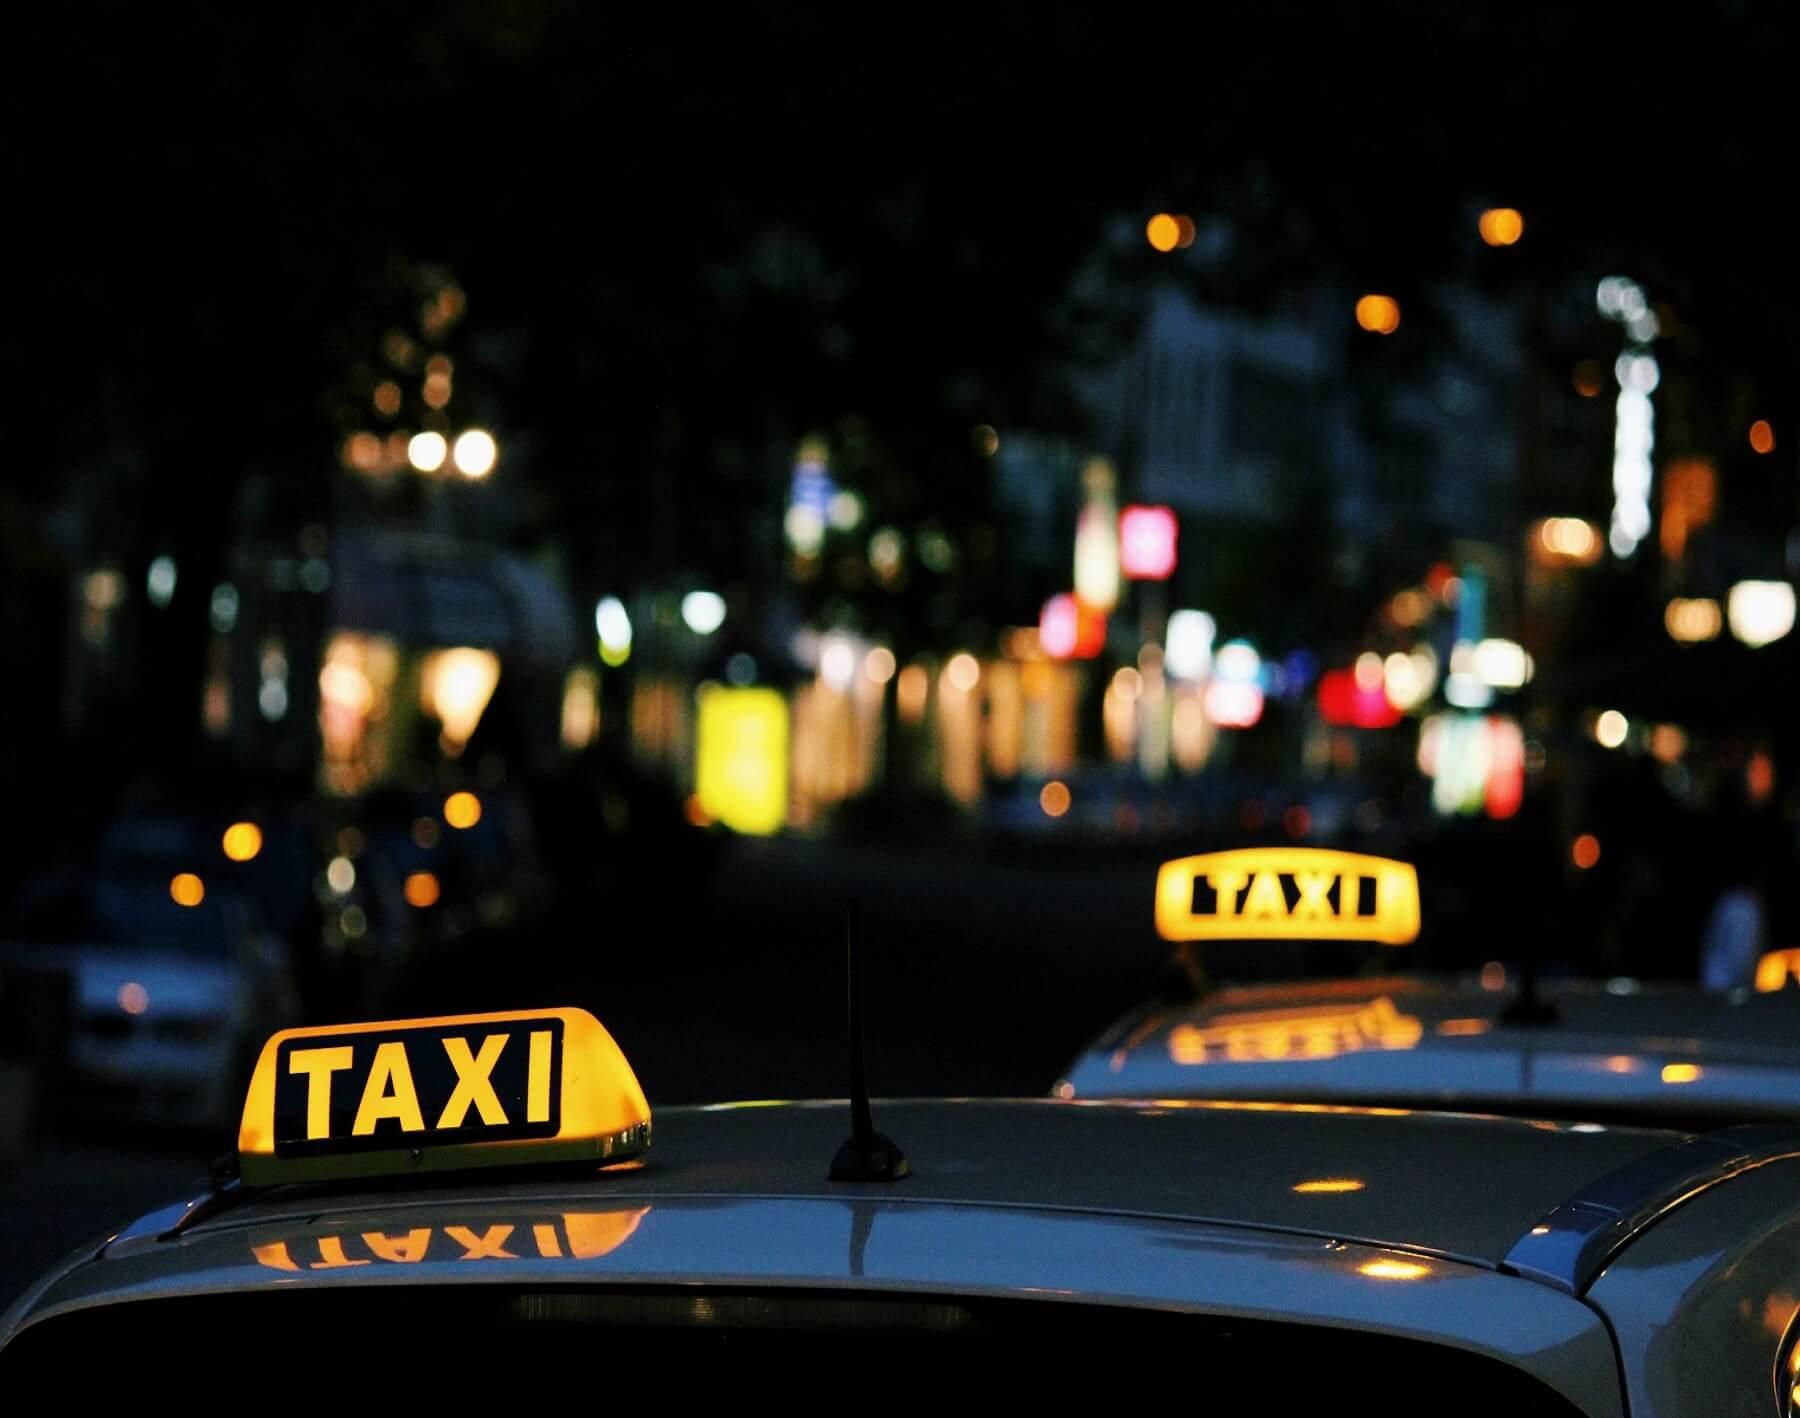 Taxis Chislehurst, Sherbets Mini Cabs